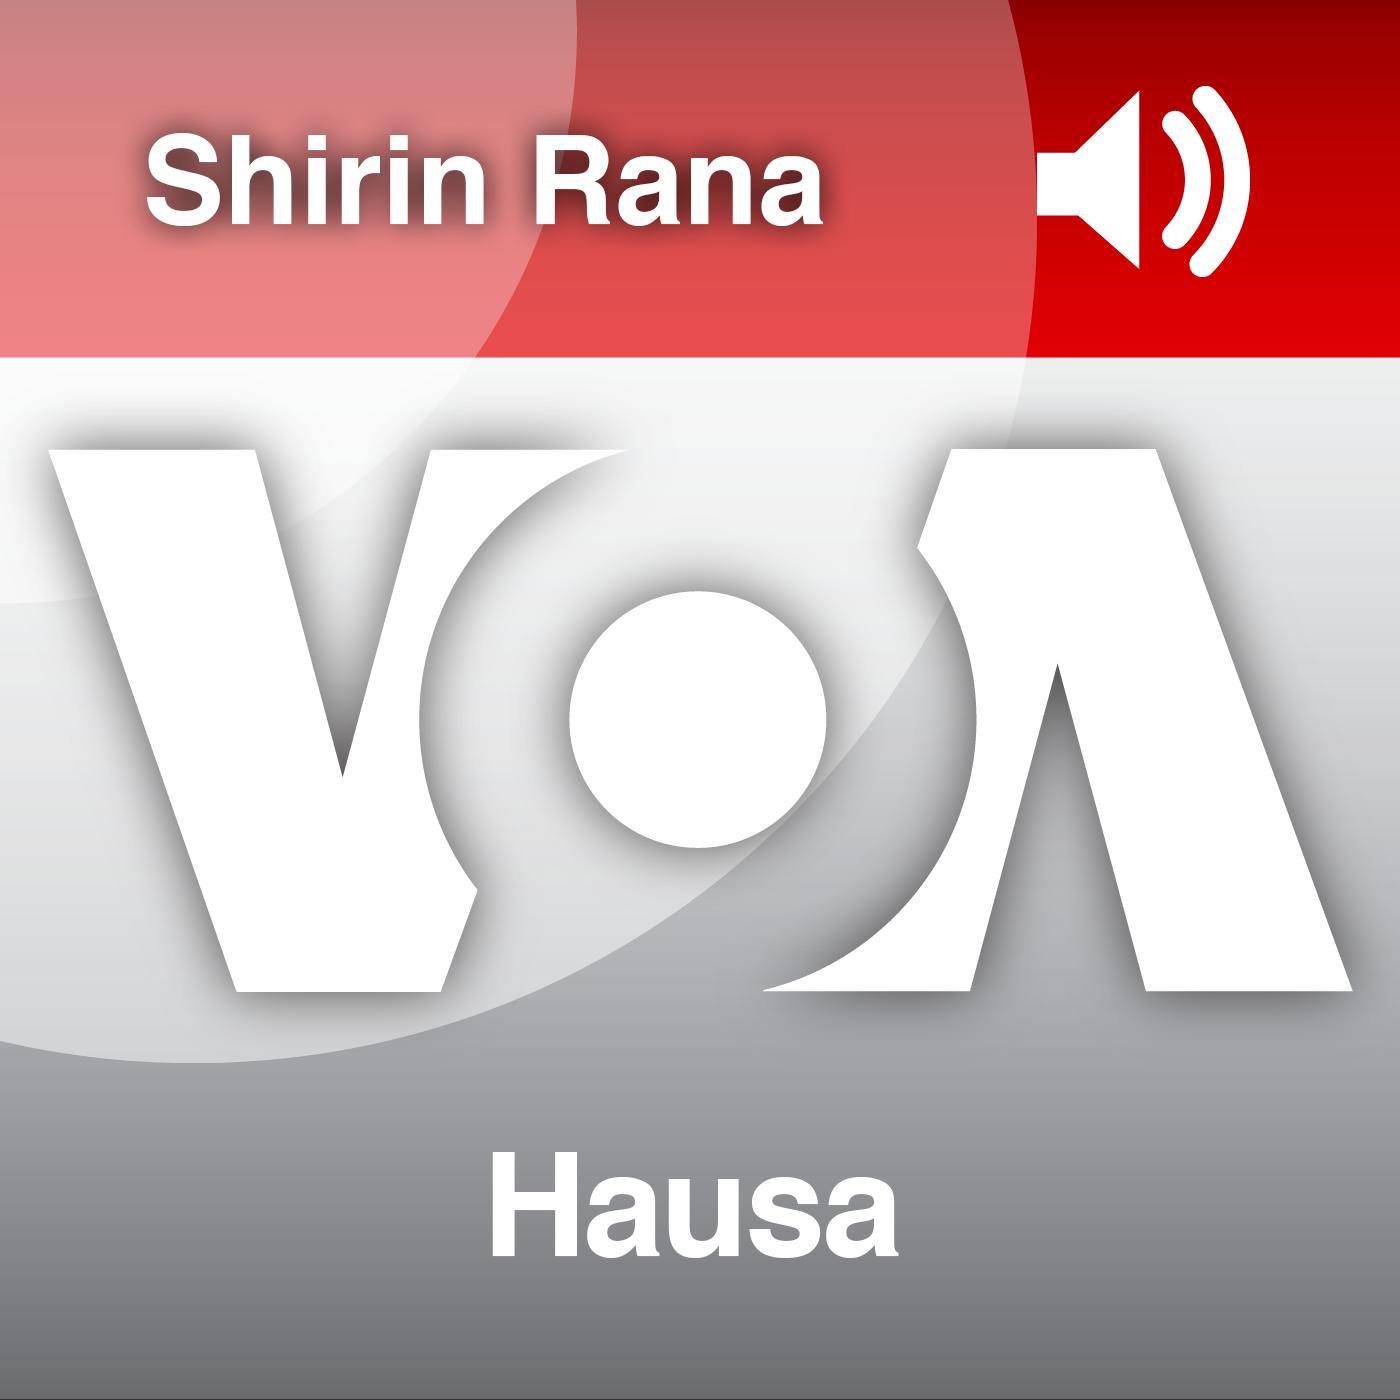 Shirin Rana 1500 UTC - Voice of America